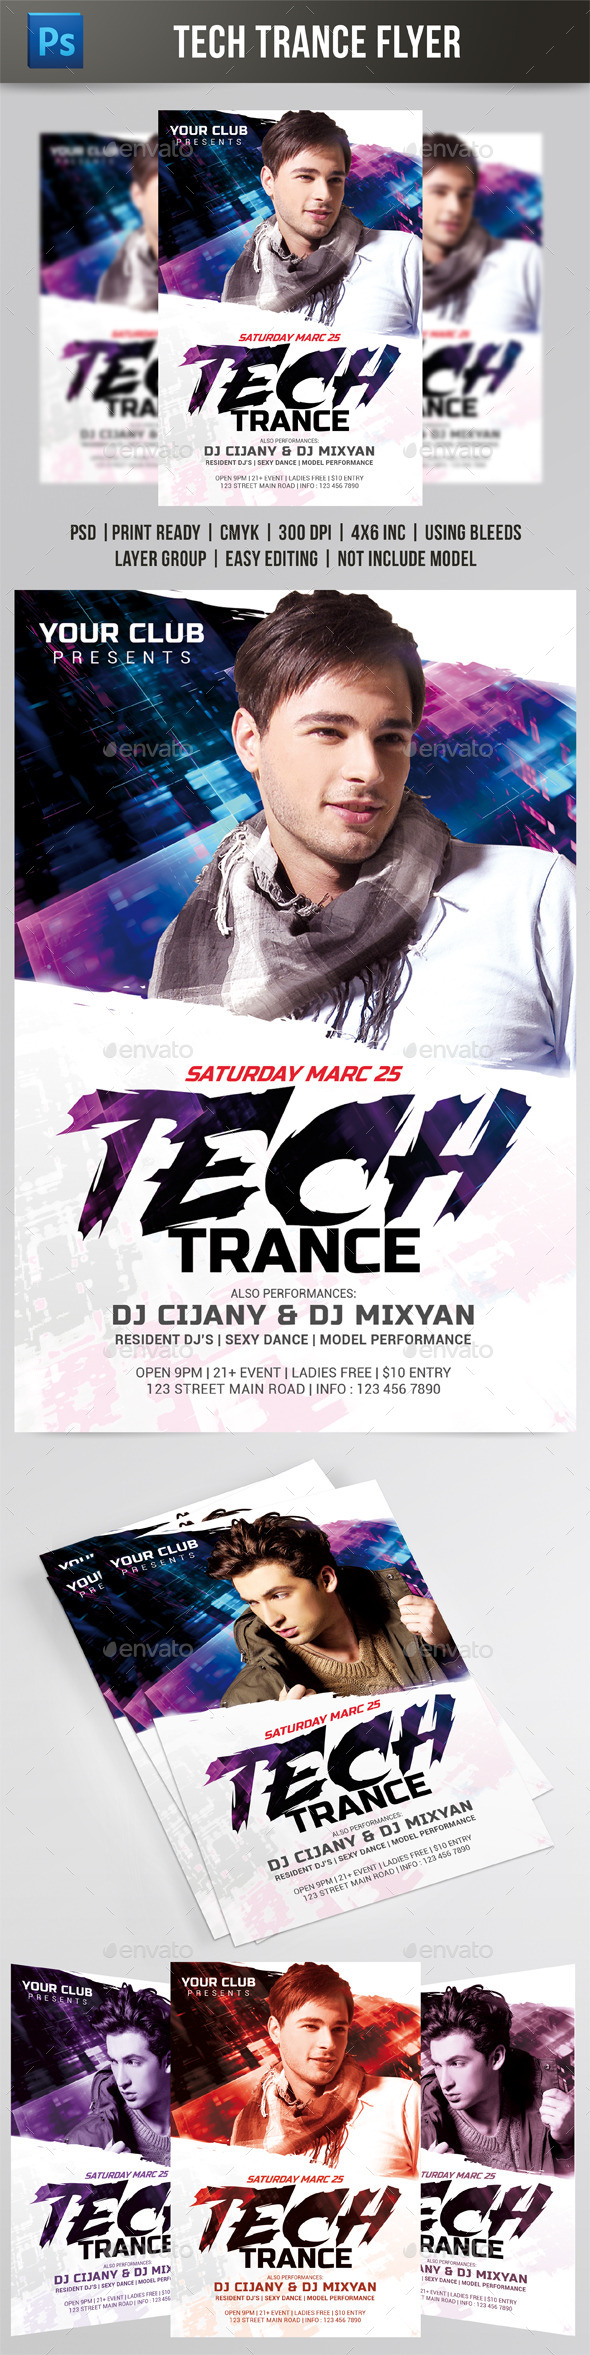 Tech Trance Flyer